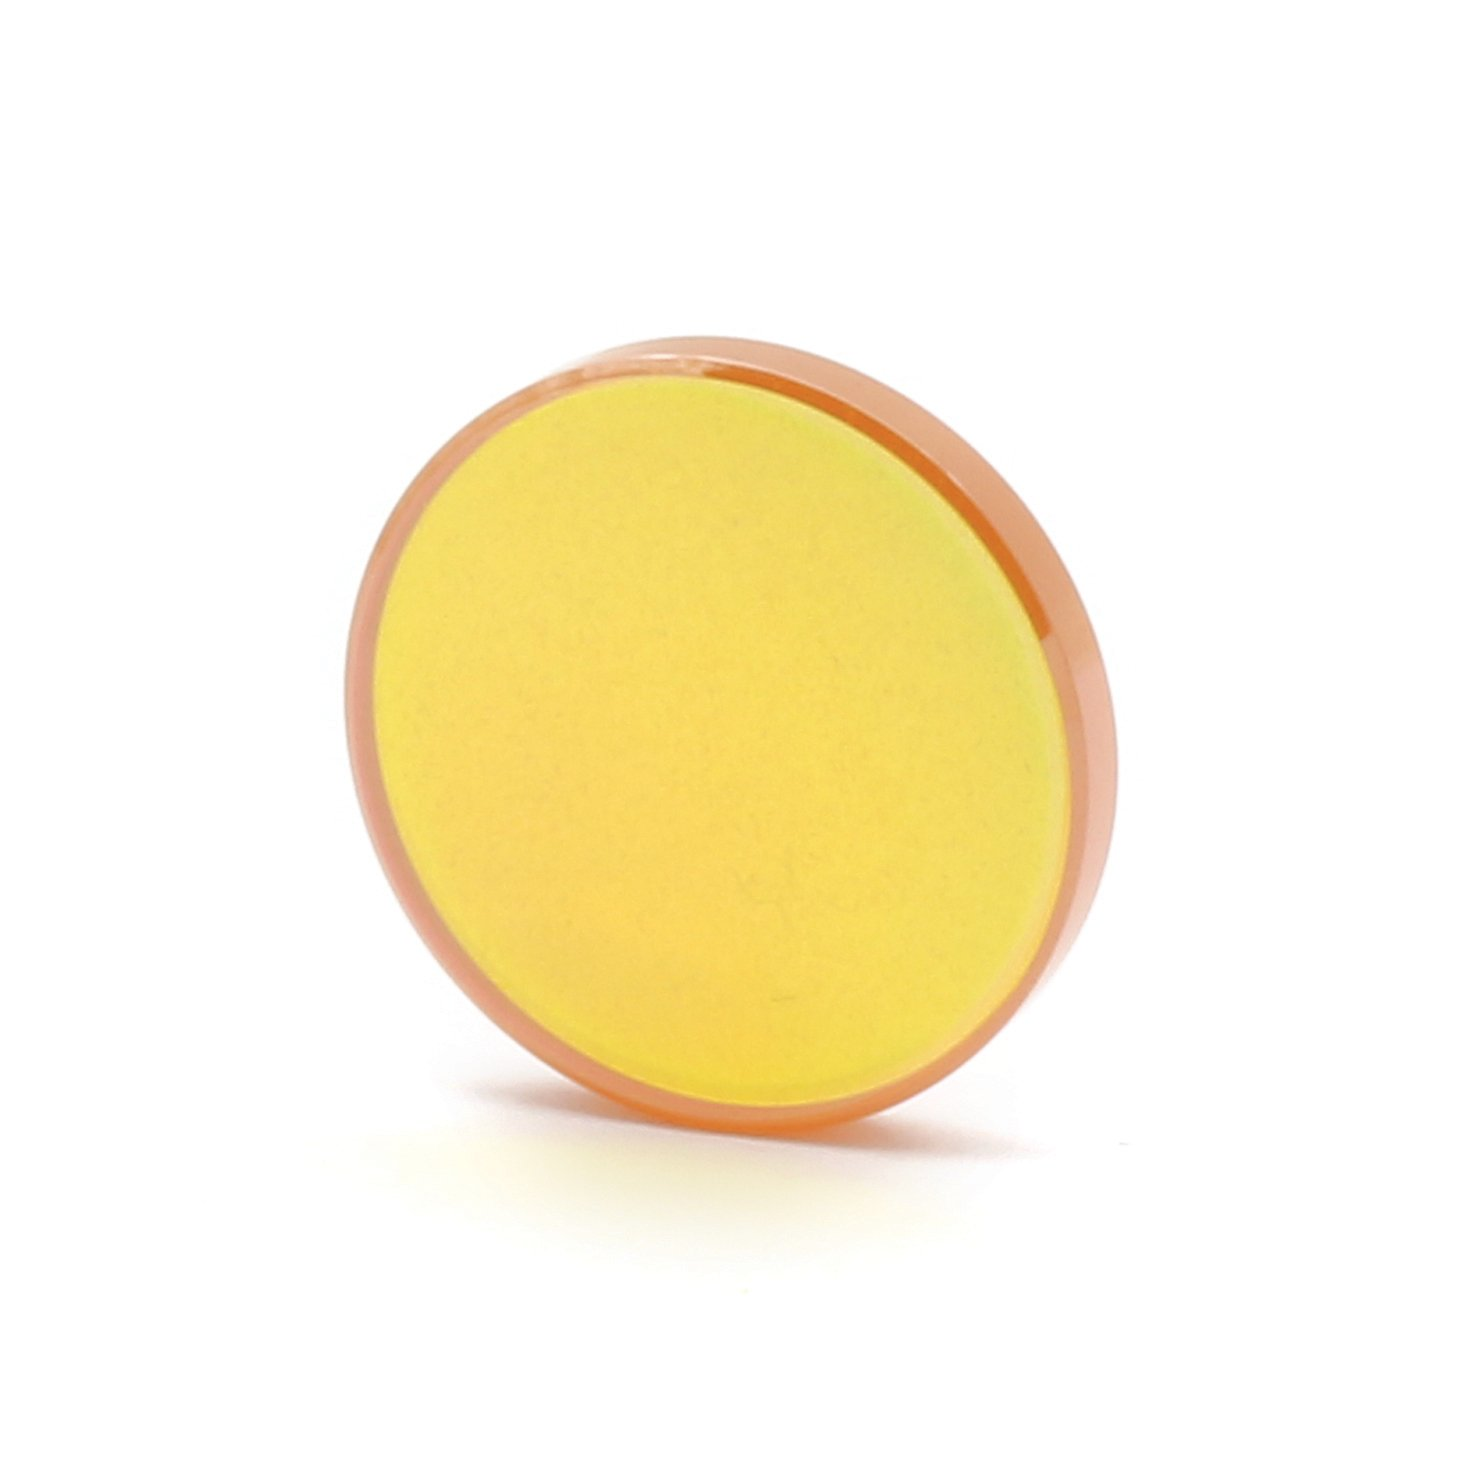 Zinc Selenide ZnSe Laser CO2 Focus Lens 20mm Laser Engraving Cutter Accessories for CO2 Laser CNC Machine RTM